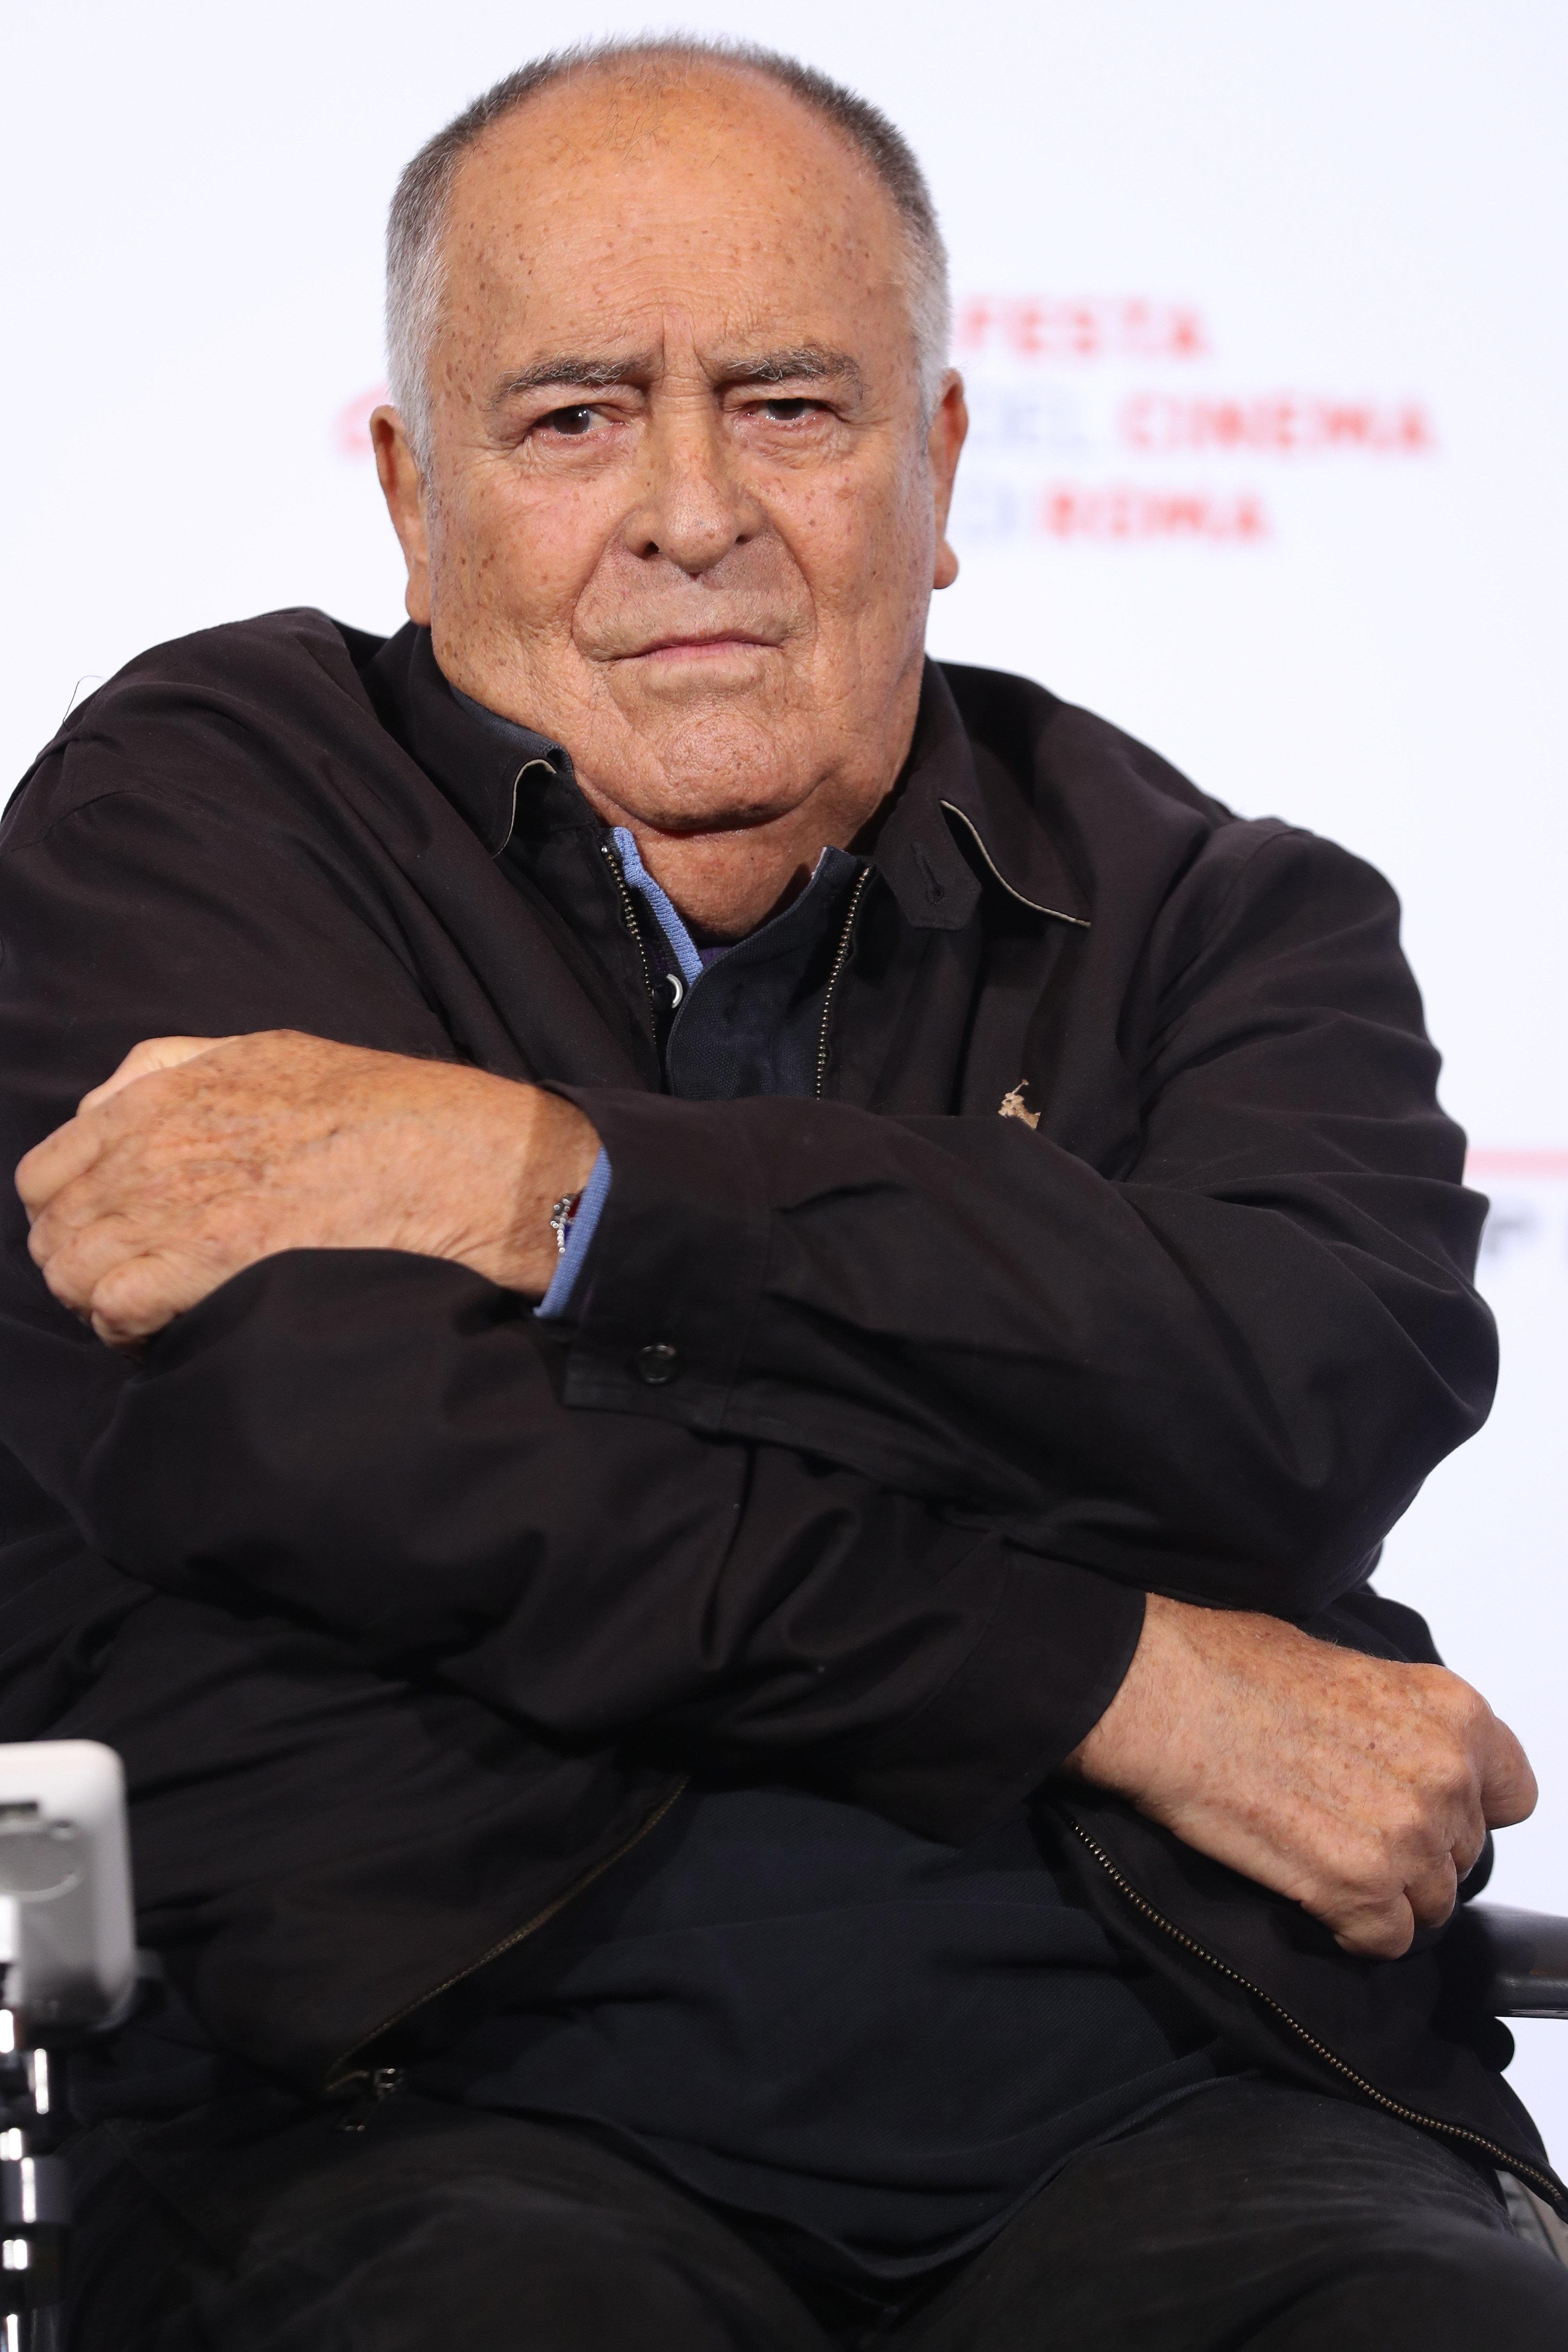 Bernardo Bertolucci attends a photocall during the 11th Rome Film Festival at Auditorium Parco Della Musica on October 15, 20